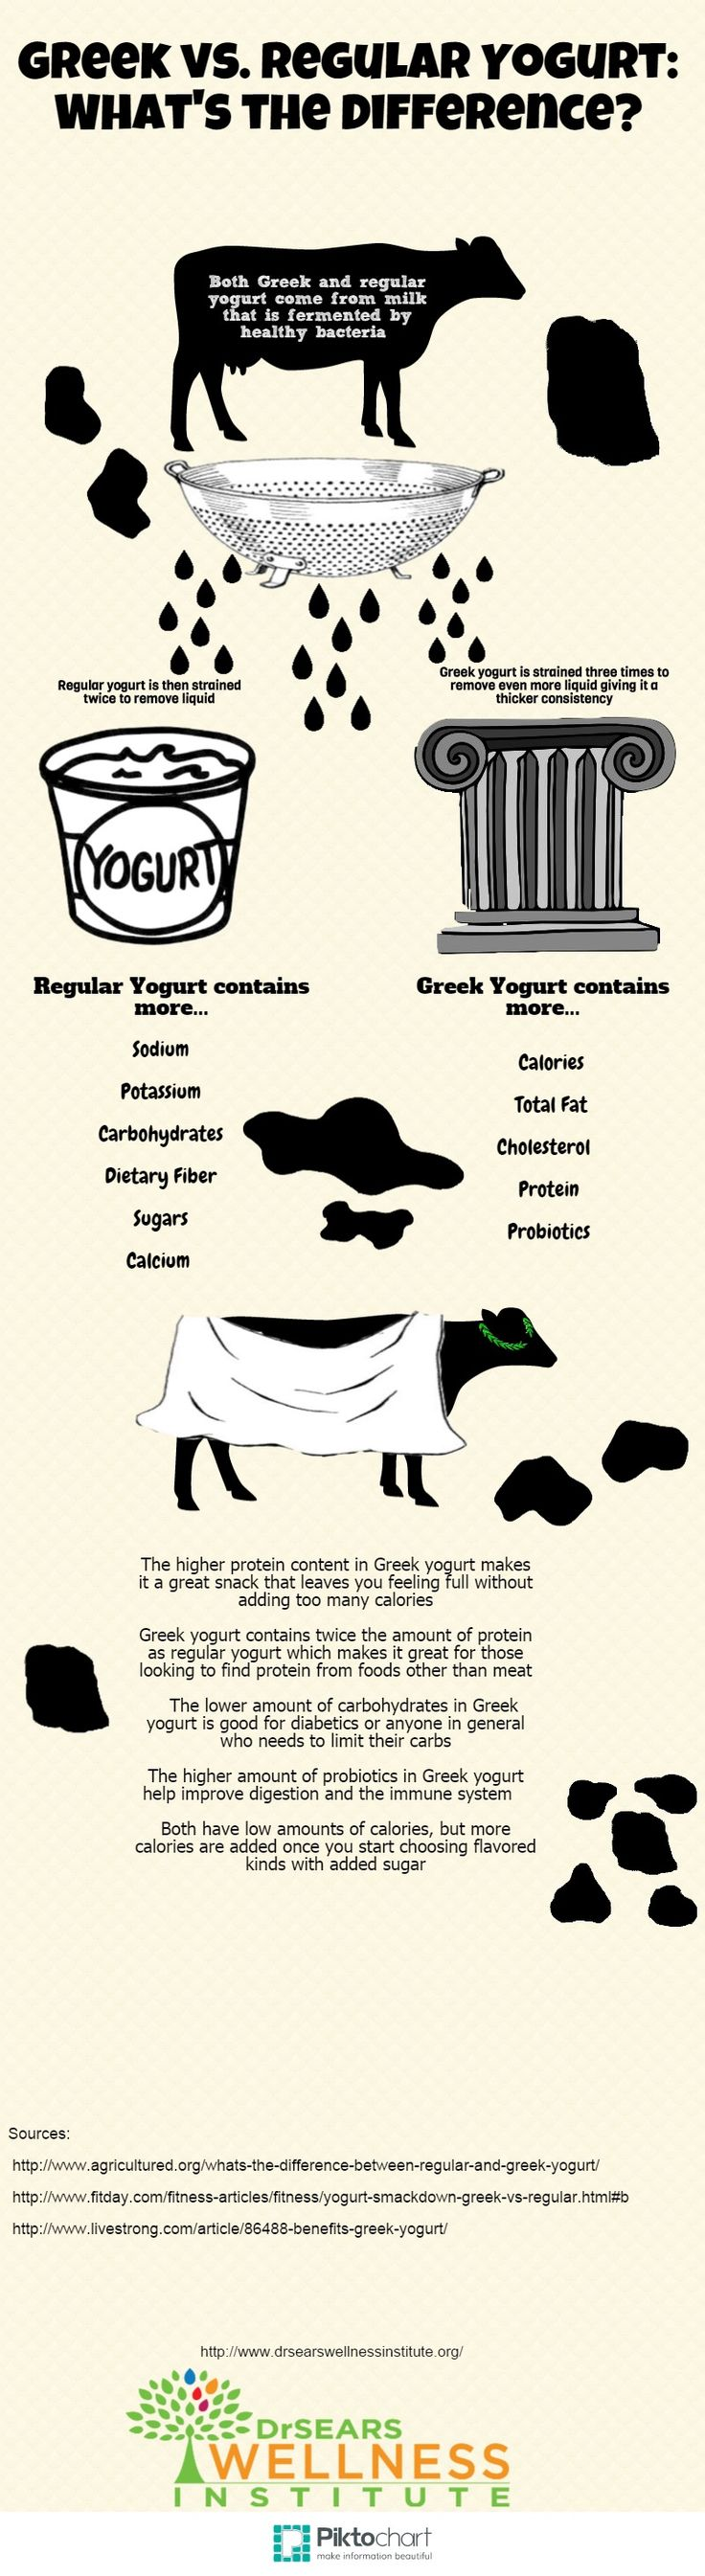 The difference between greek yogurt and regular yogurt.  https://drsearswellnessinstitute.org/blog/2014/09/greek-yogurt-vs-regular-yogurt/